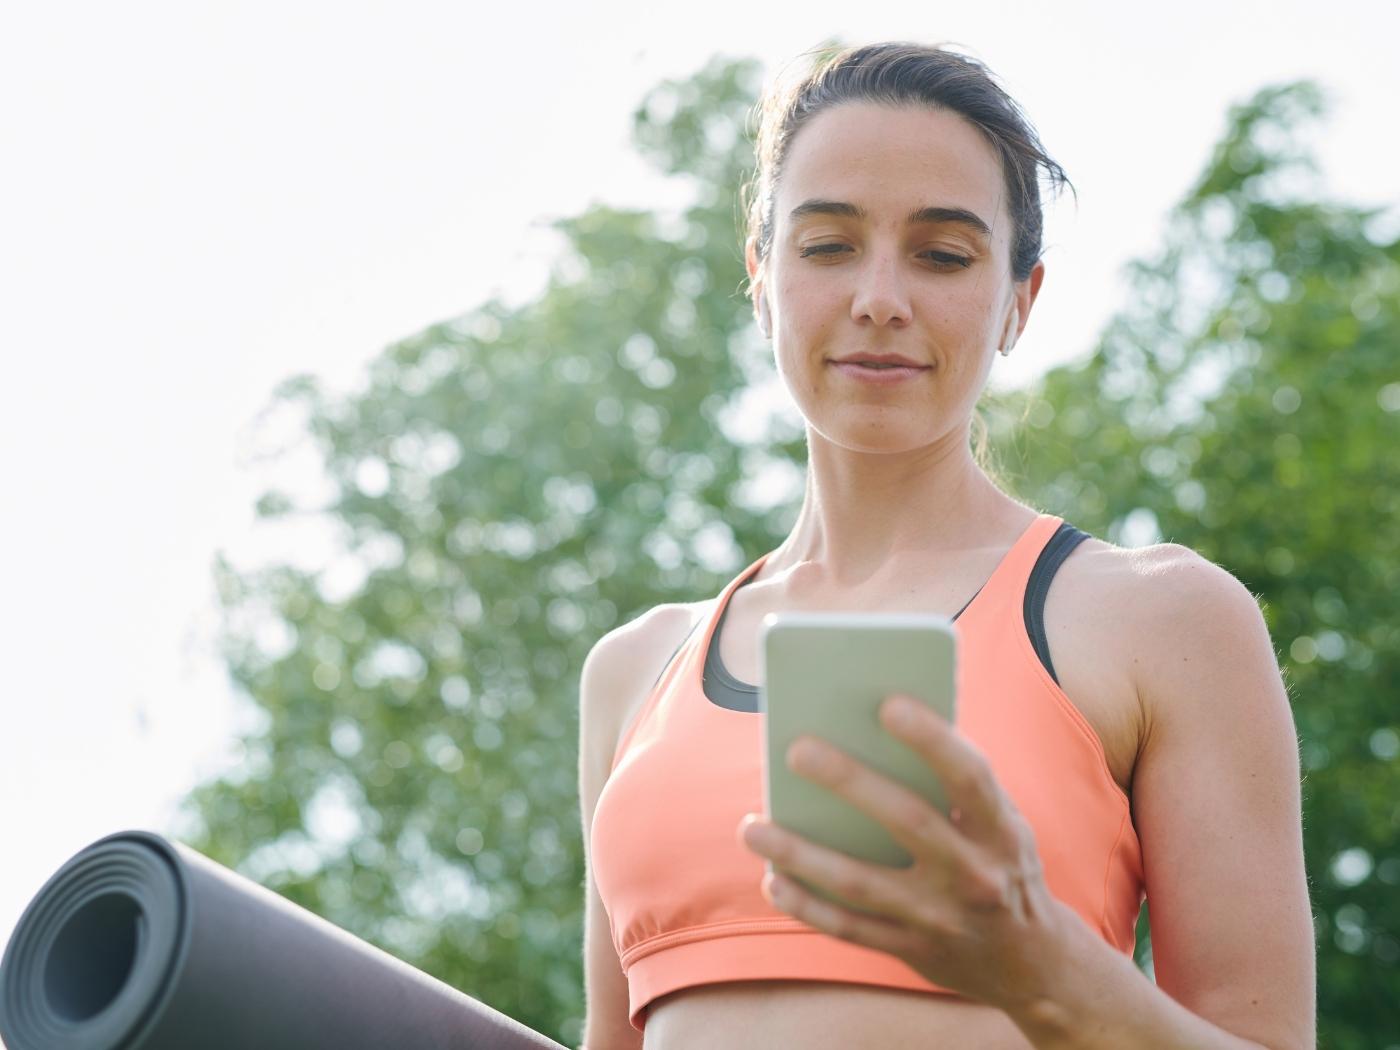 social media tipps für yoga und fitness